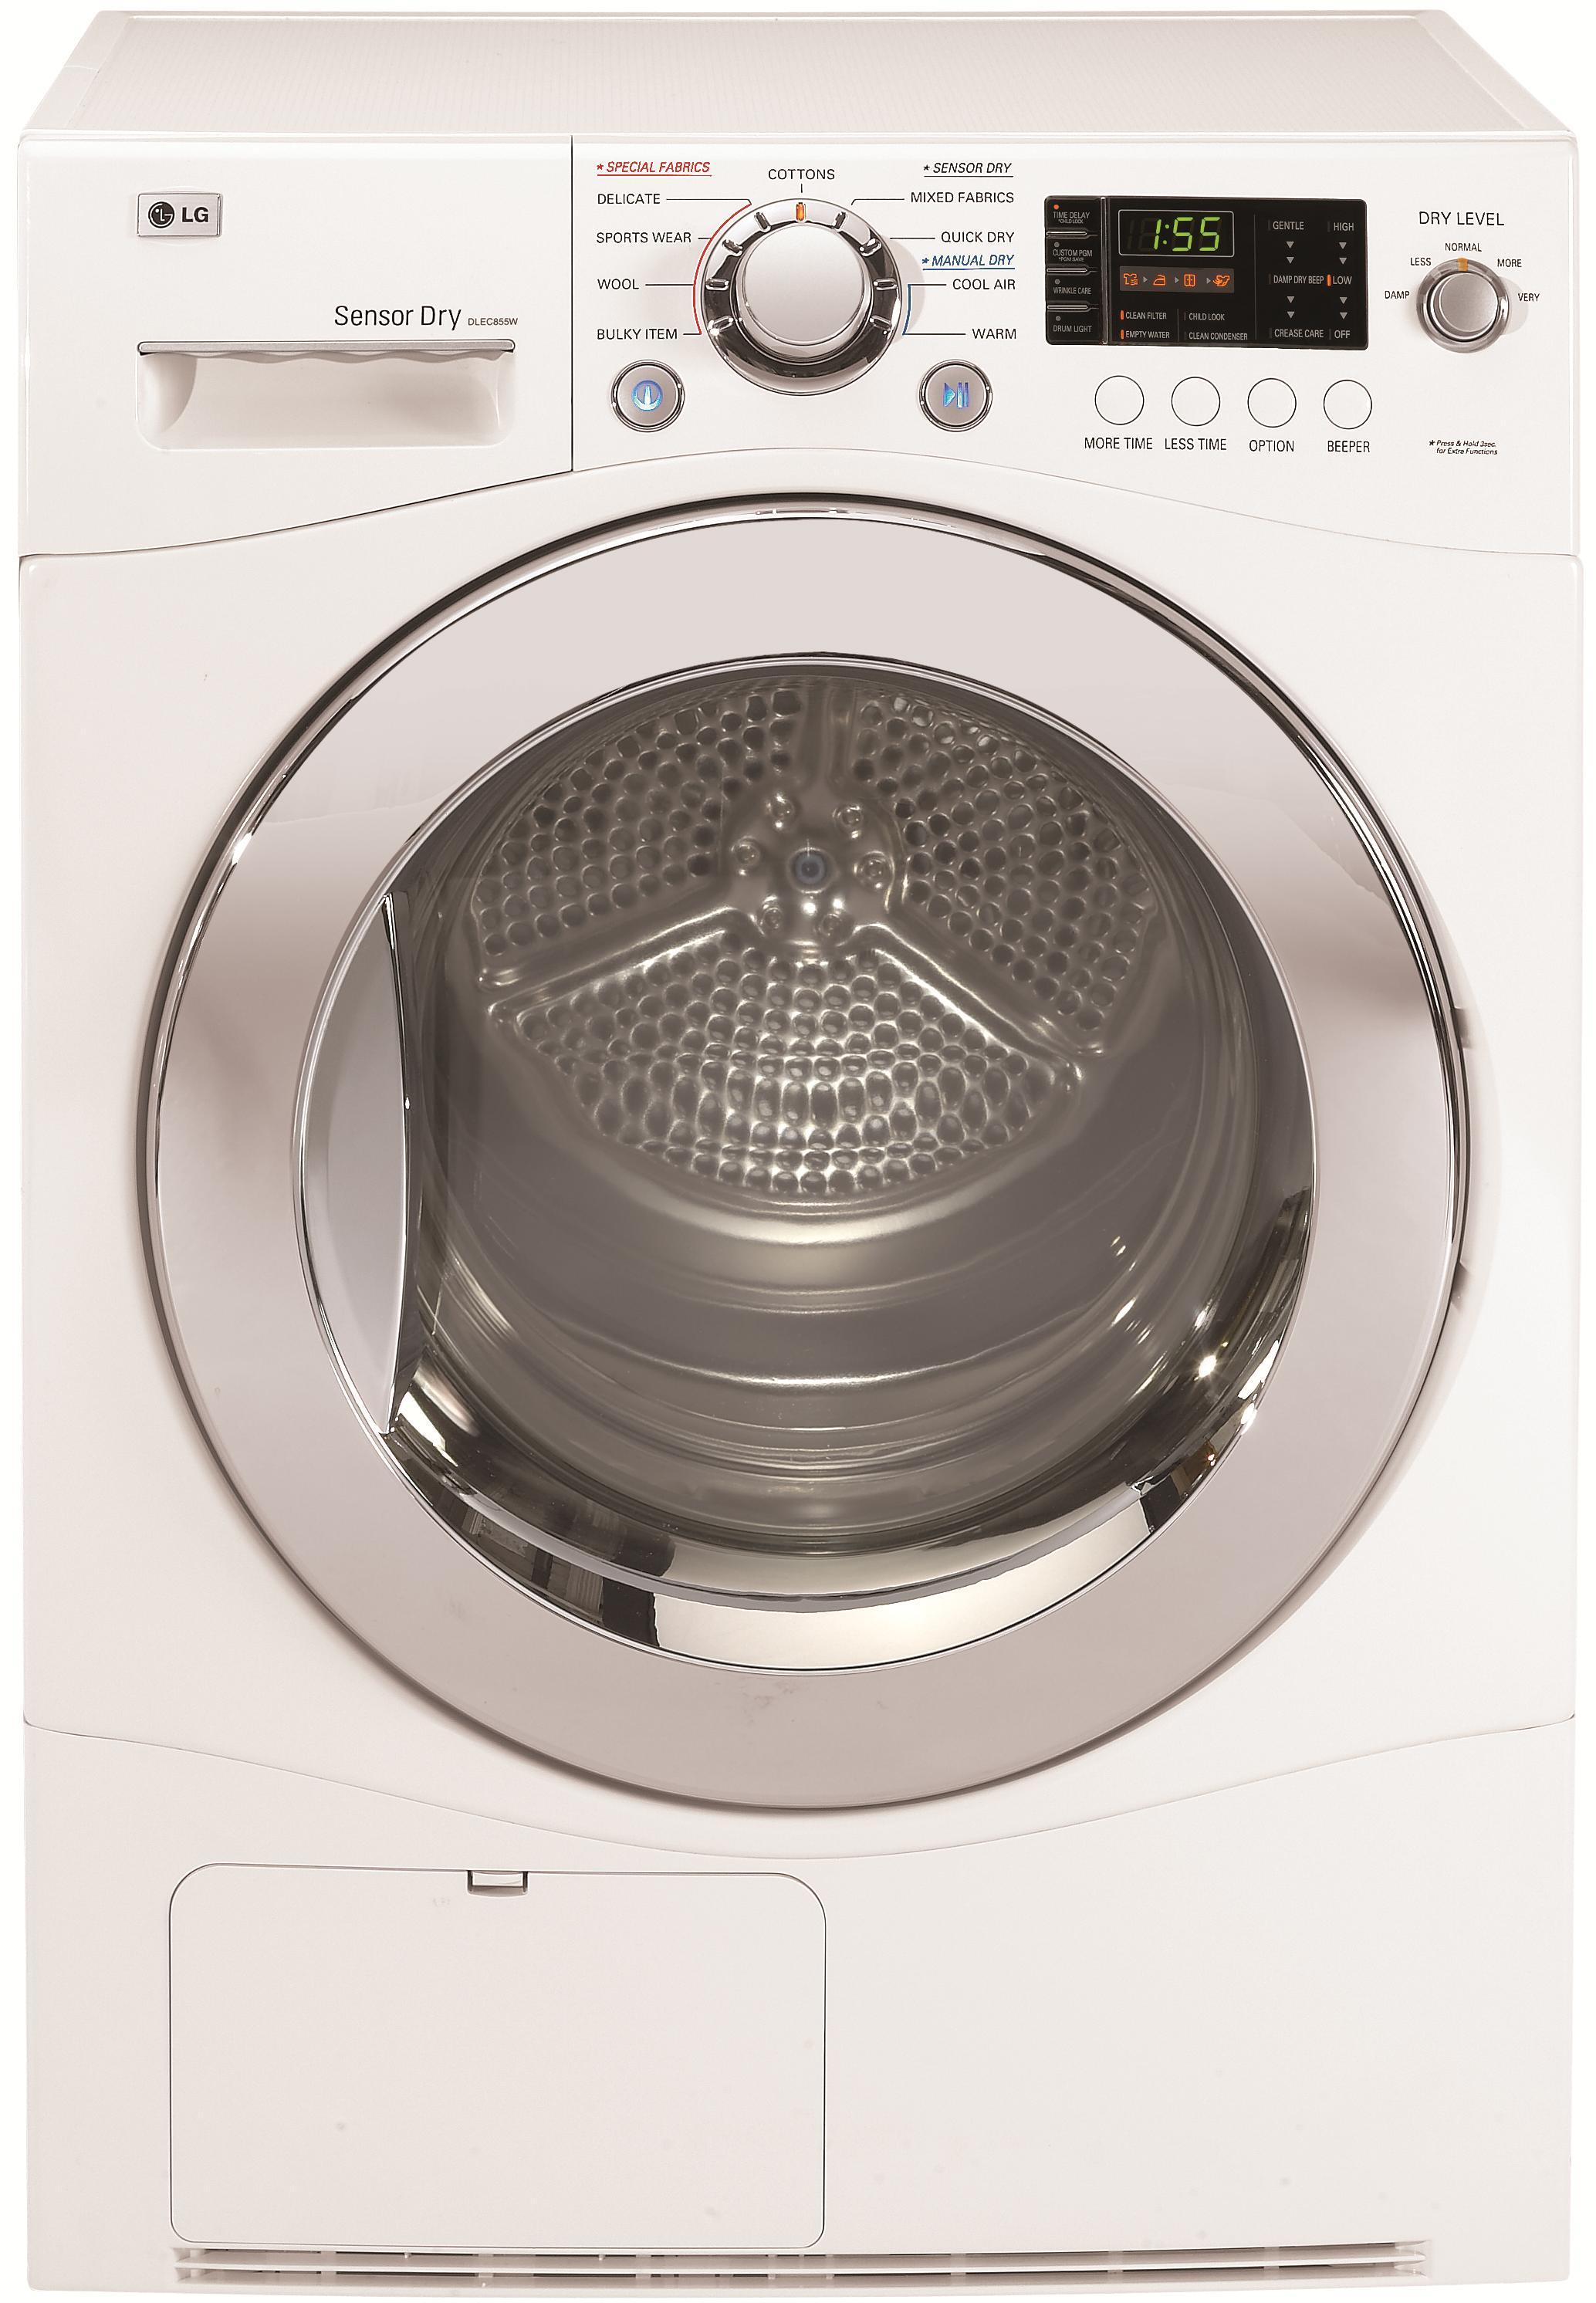 LG Appliances Electric Dryers 4.2 Cu. Ft. Electric Front-Load Dryer - Item Number: DLEC855W